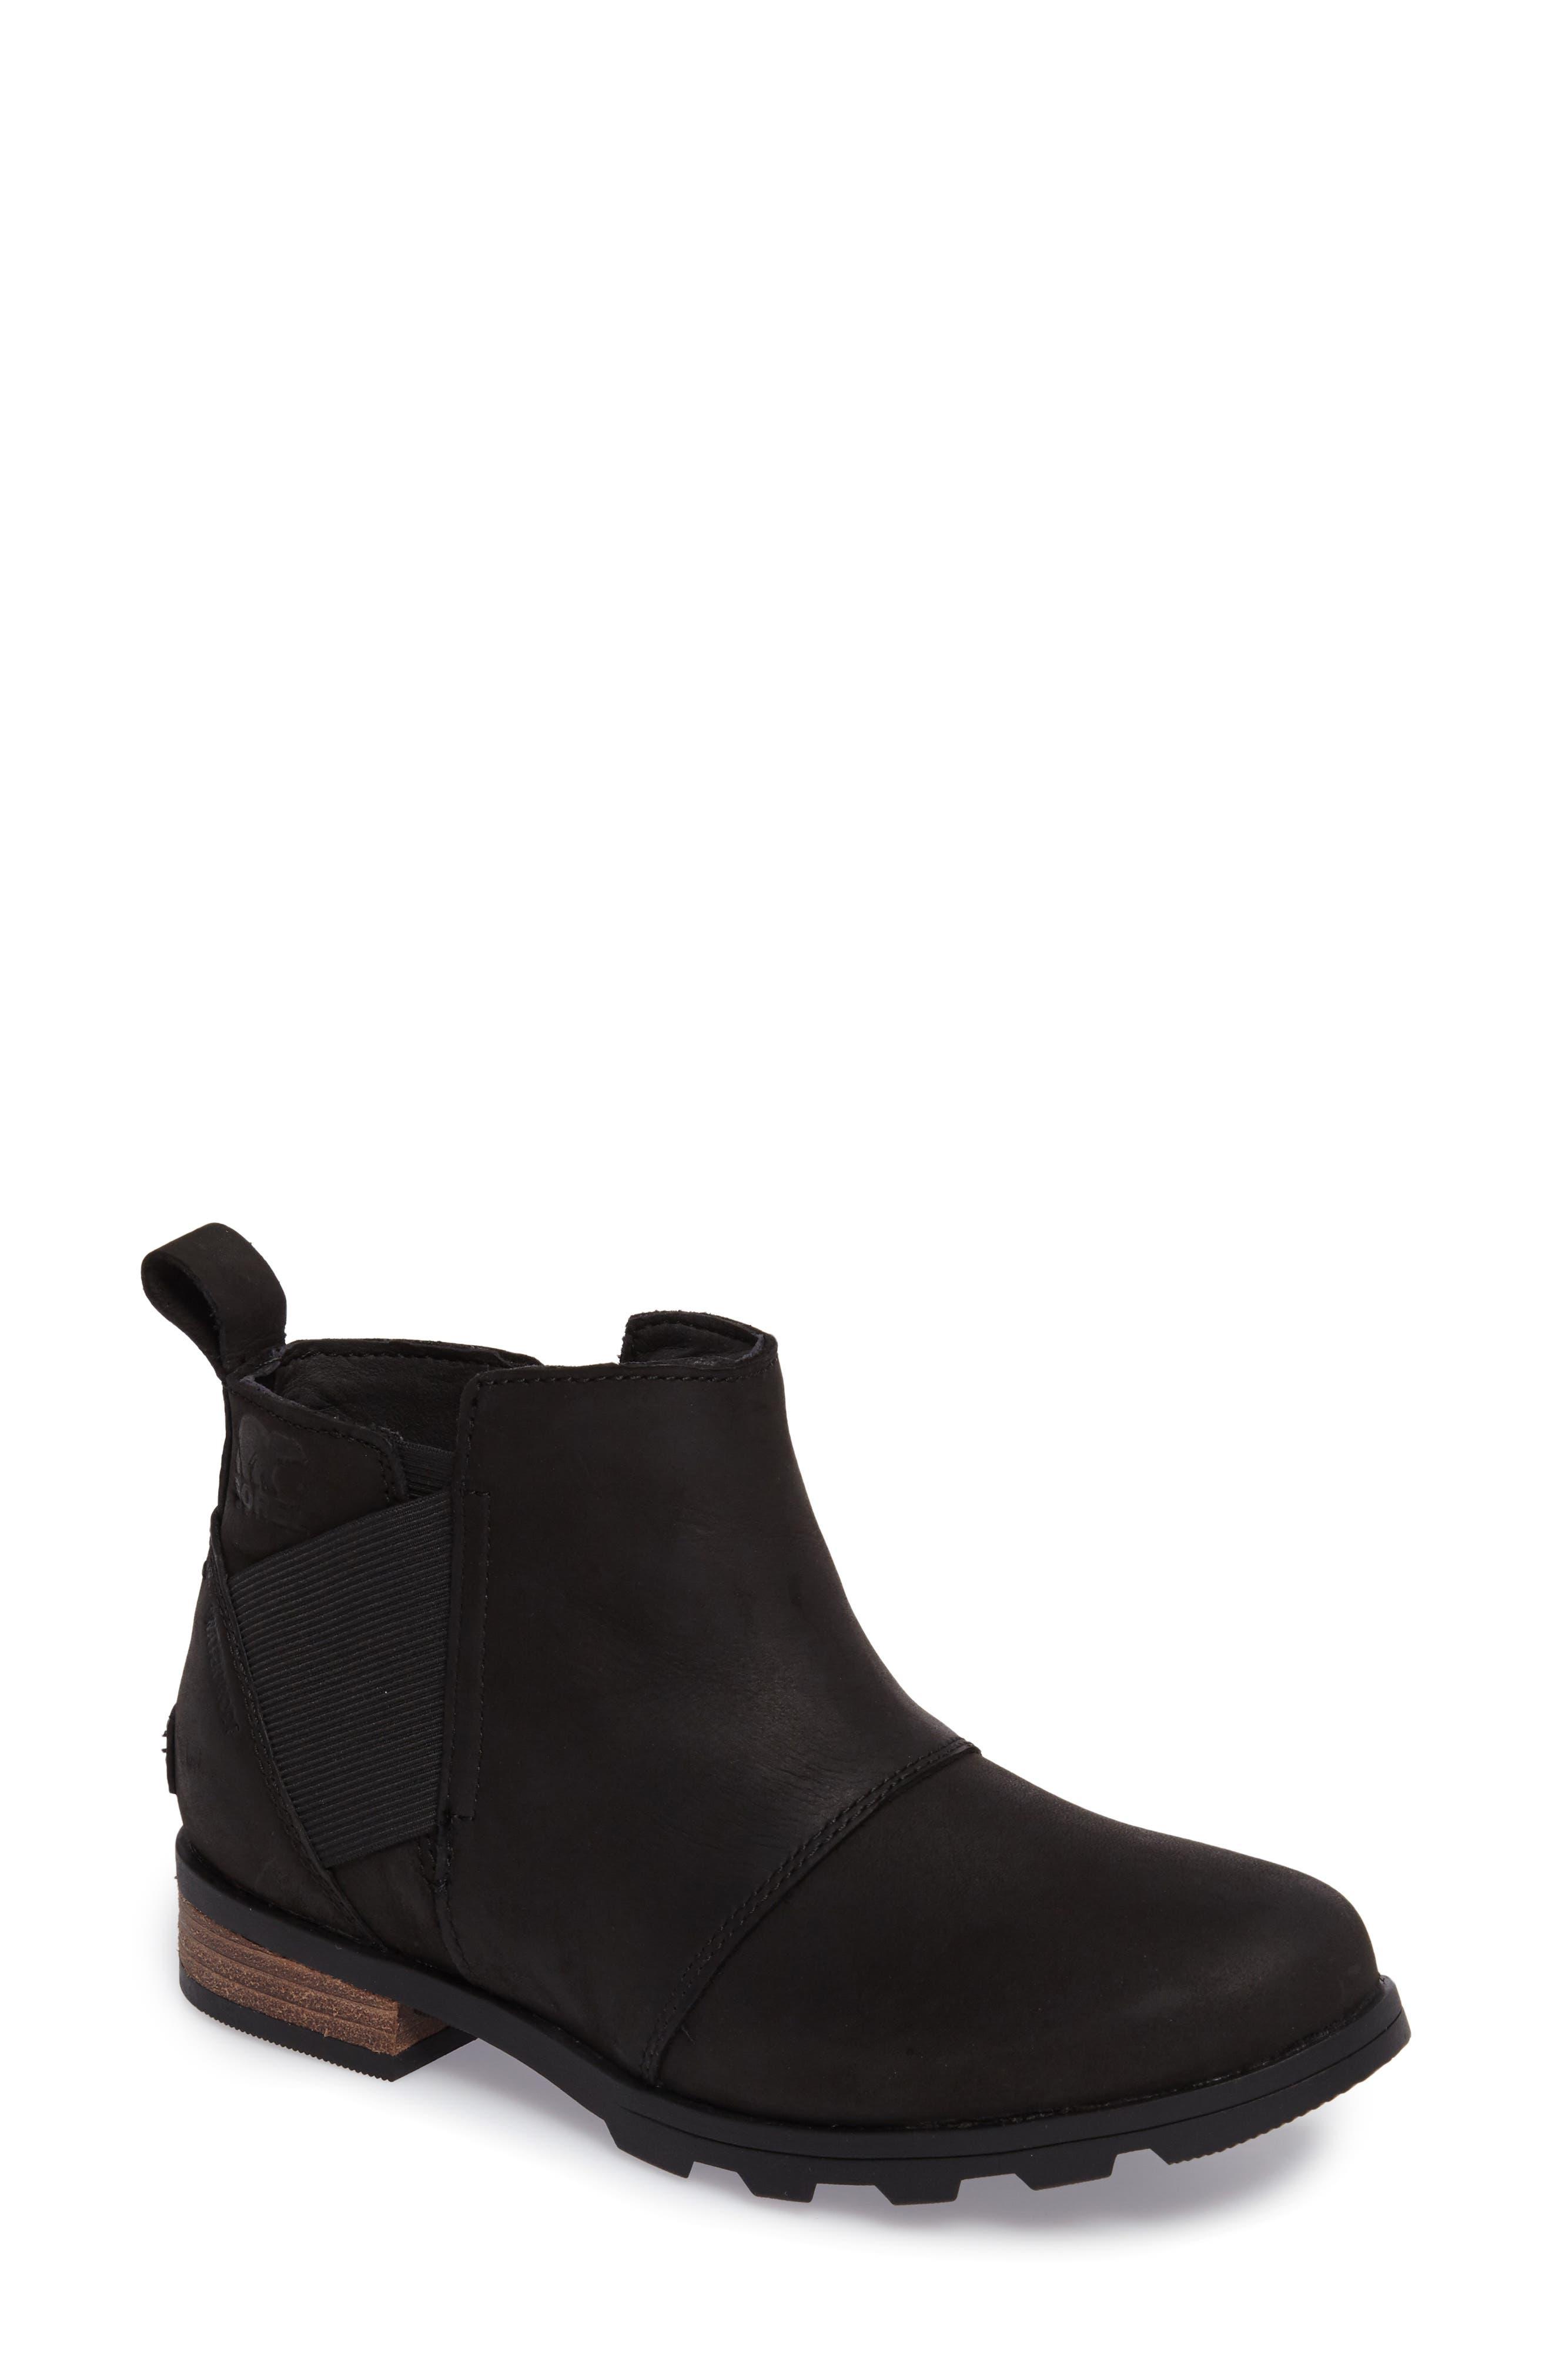 Emelie Waterproof Chelsea Boot,                             Main thumbnail 1, color,                             Black/ Black